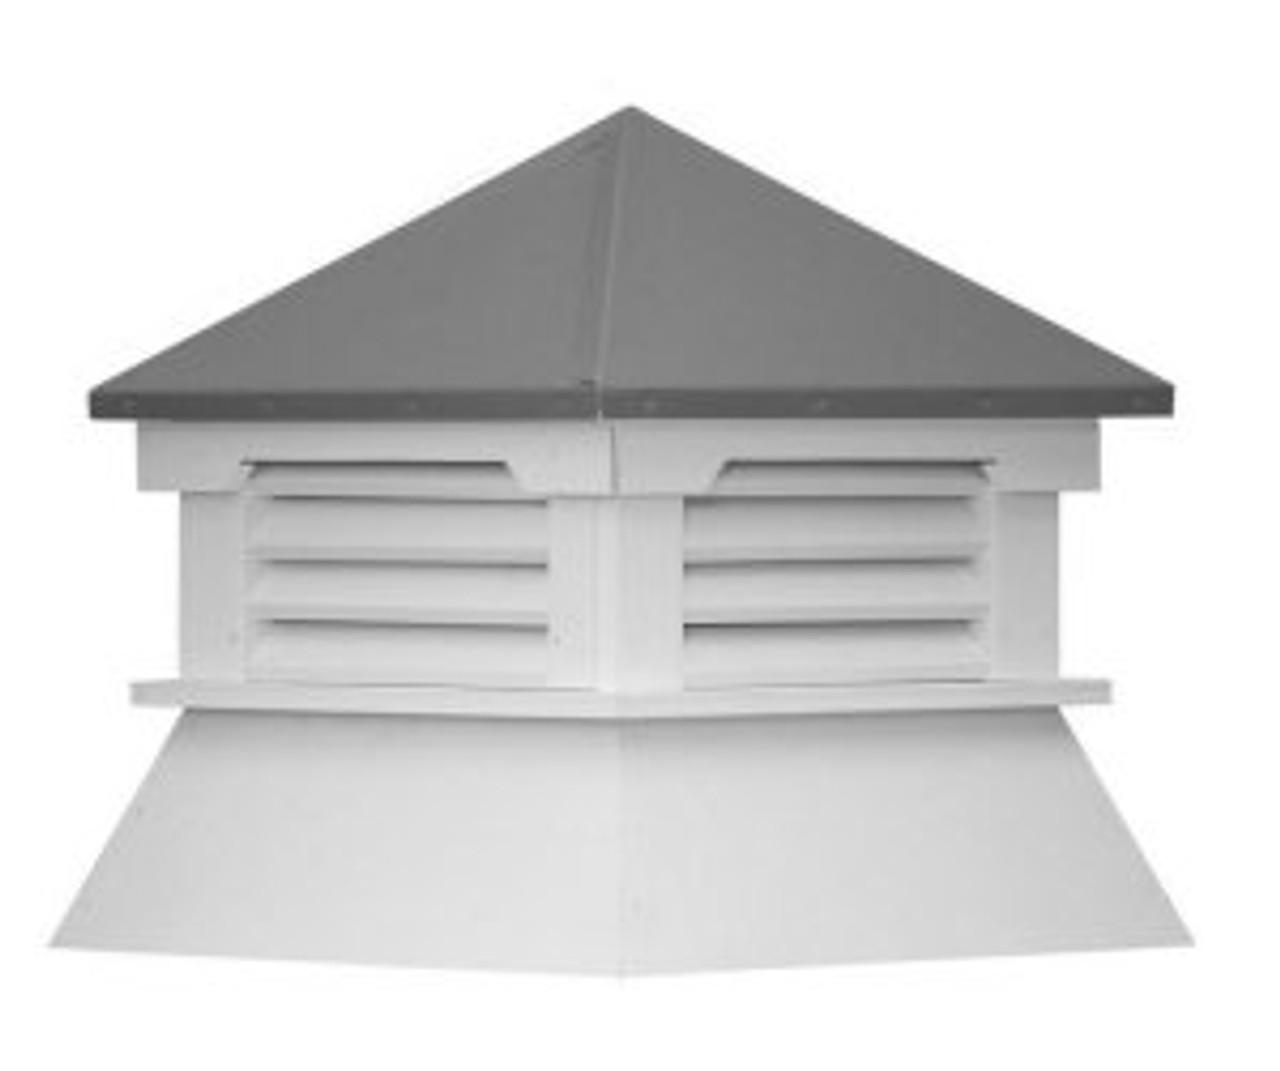 Cupola - Classic Shed: Azek - Aluminum Top - 30Lx30Wx36H